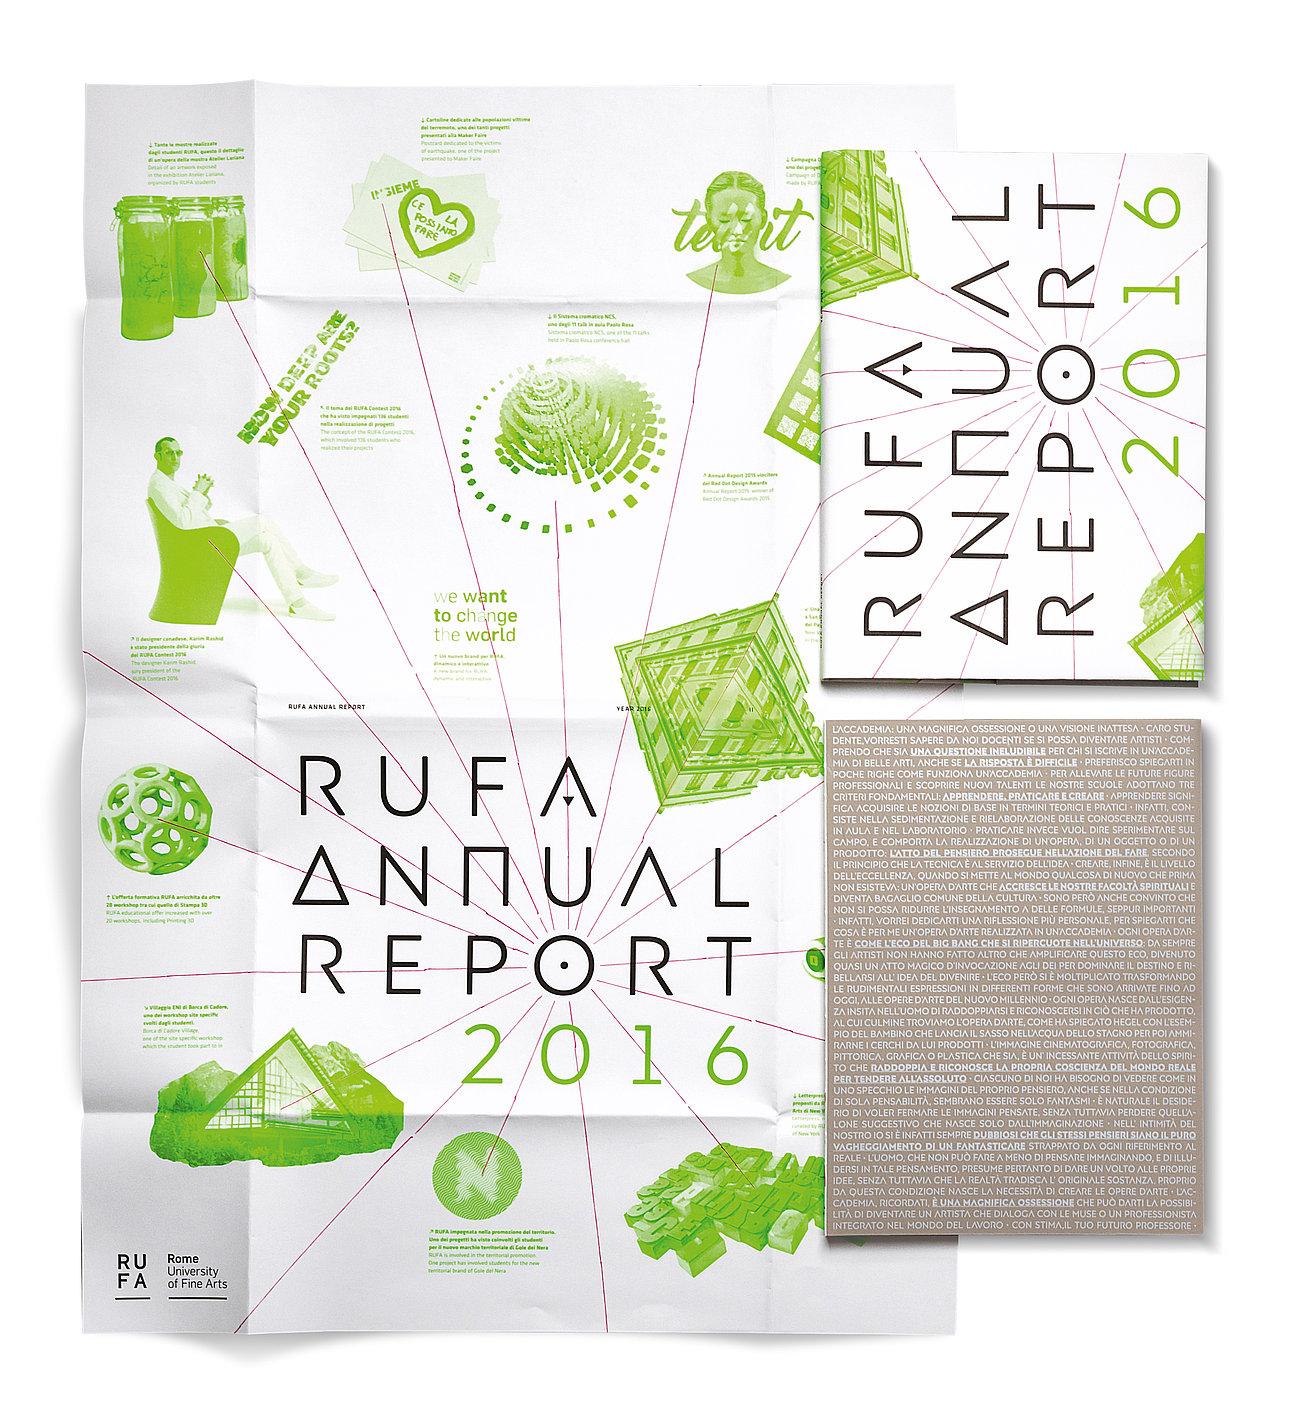 RUFA Annual Report 2016 | Red Dot Design Award